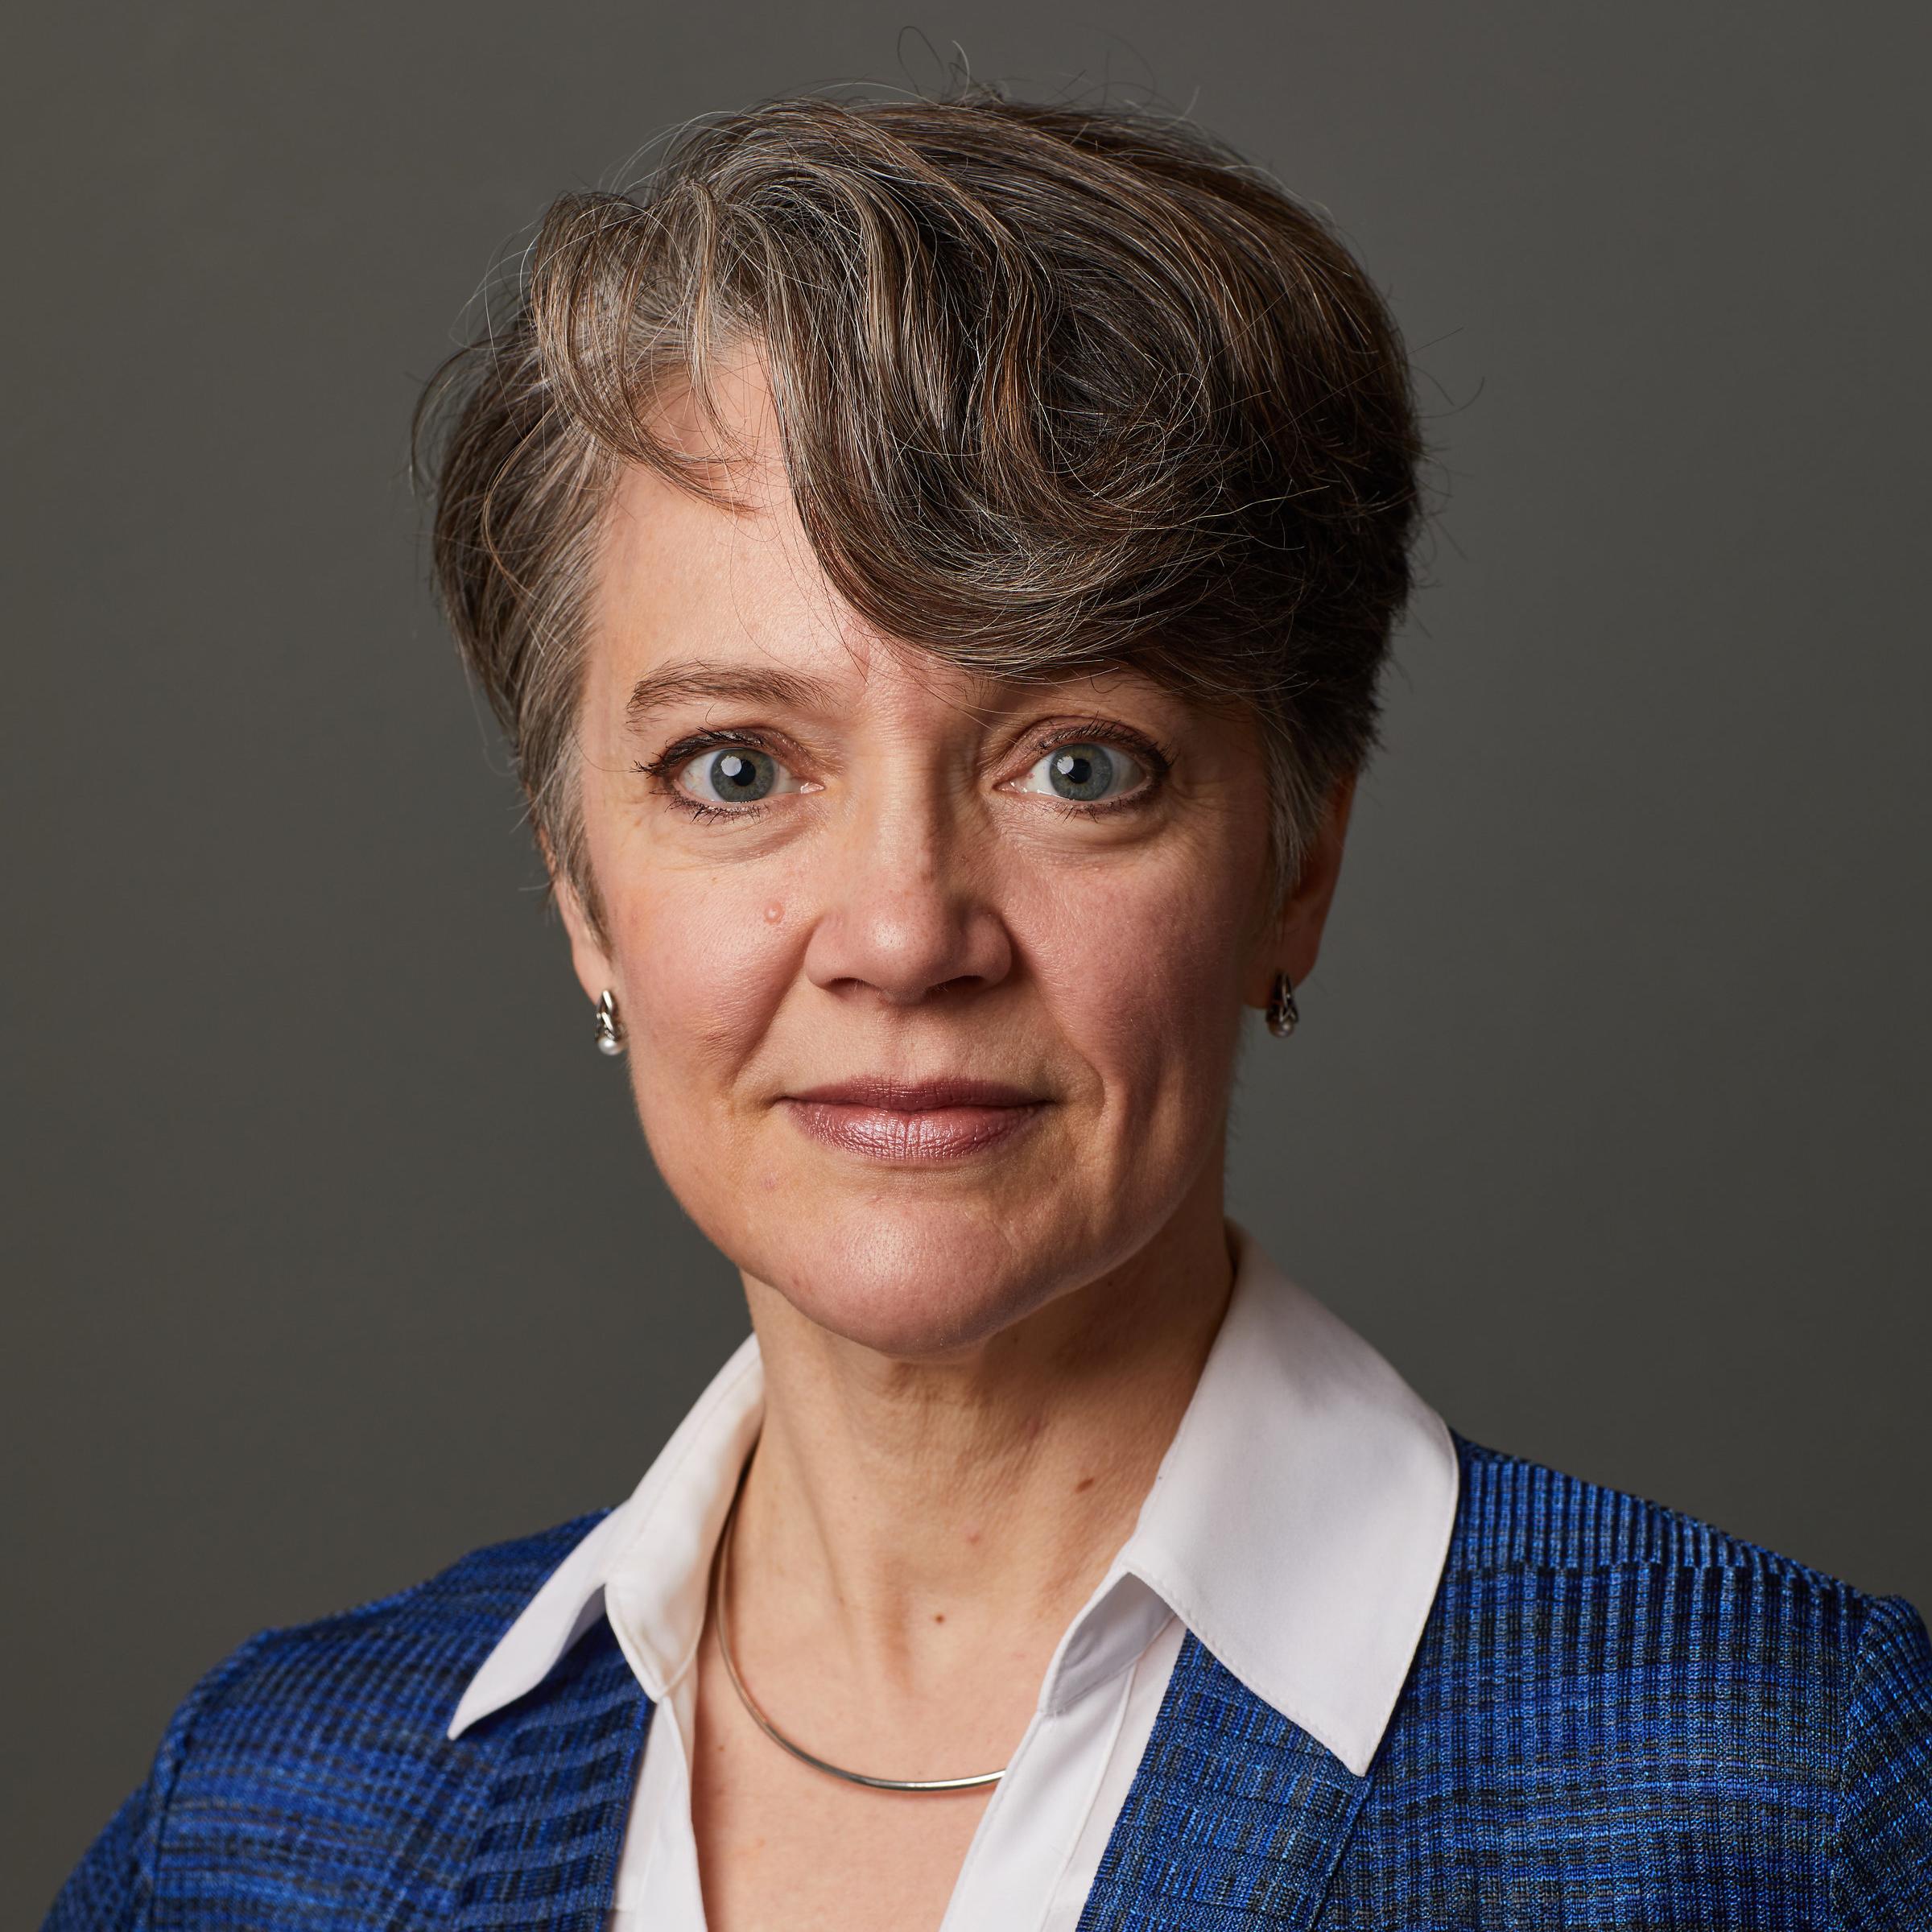 Jessica Anker